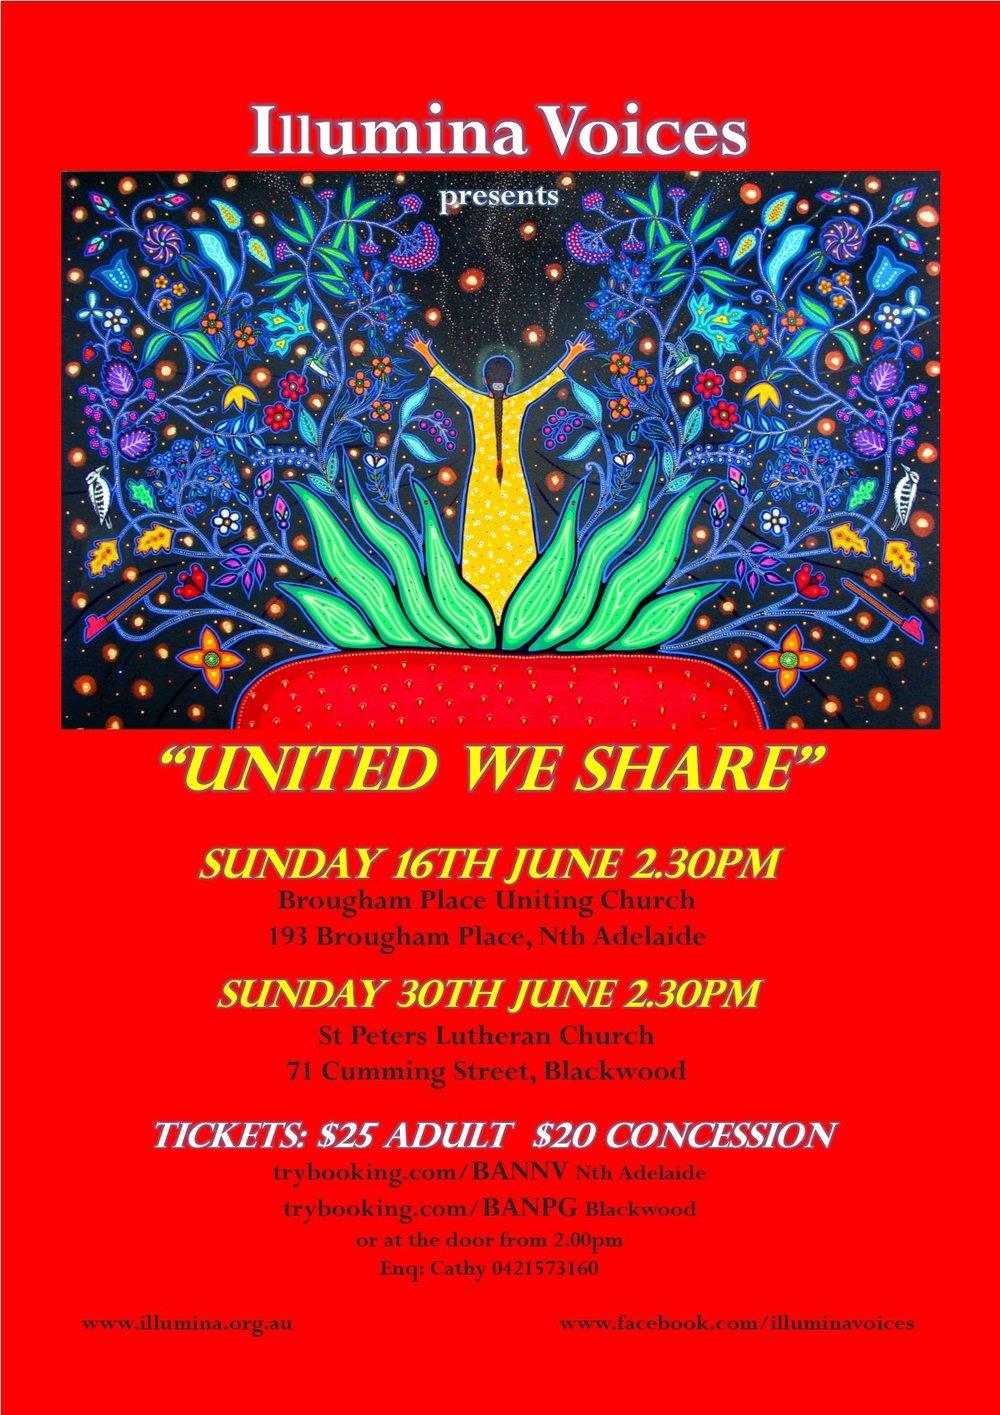 United We Share A4 flyer - June 2019.jpg